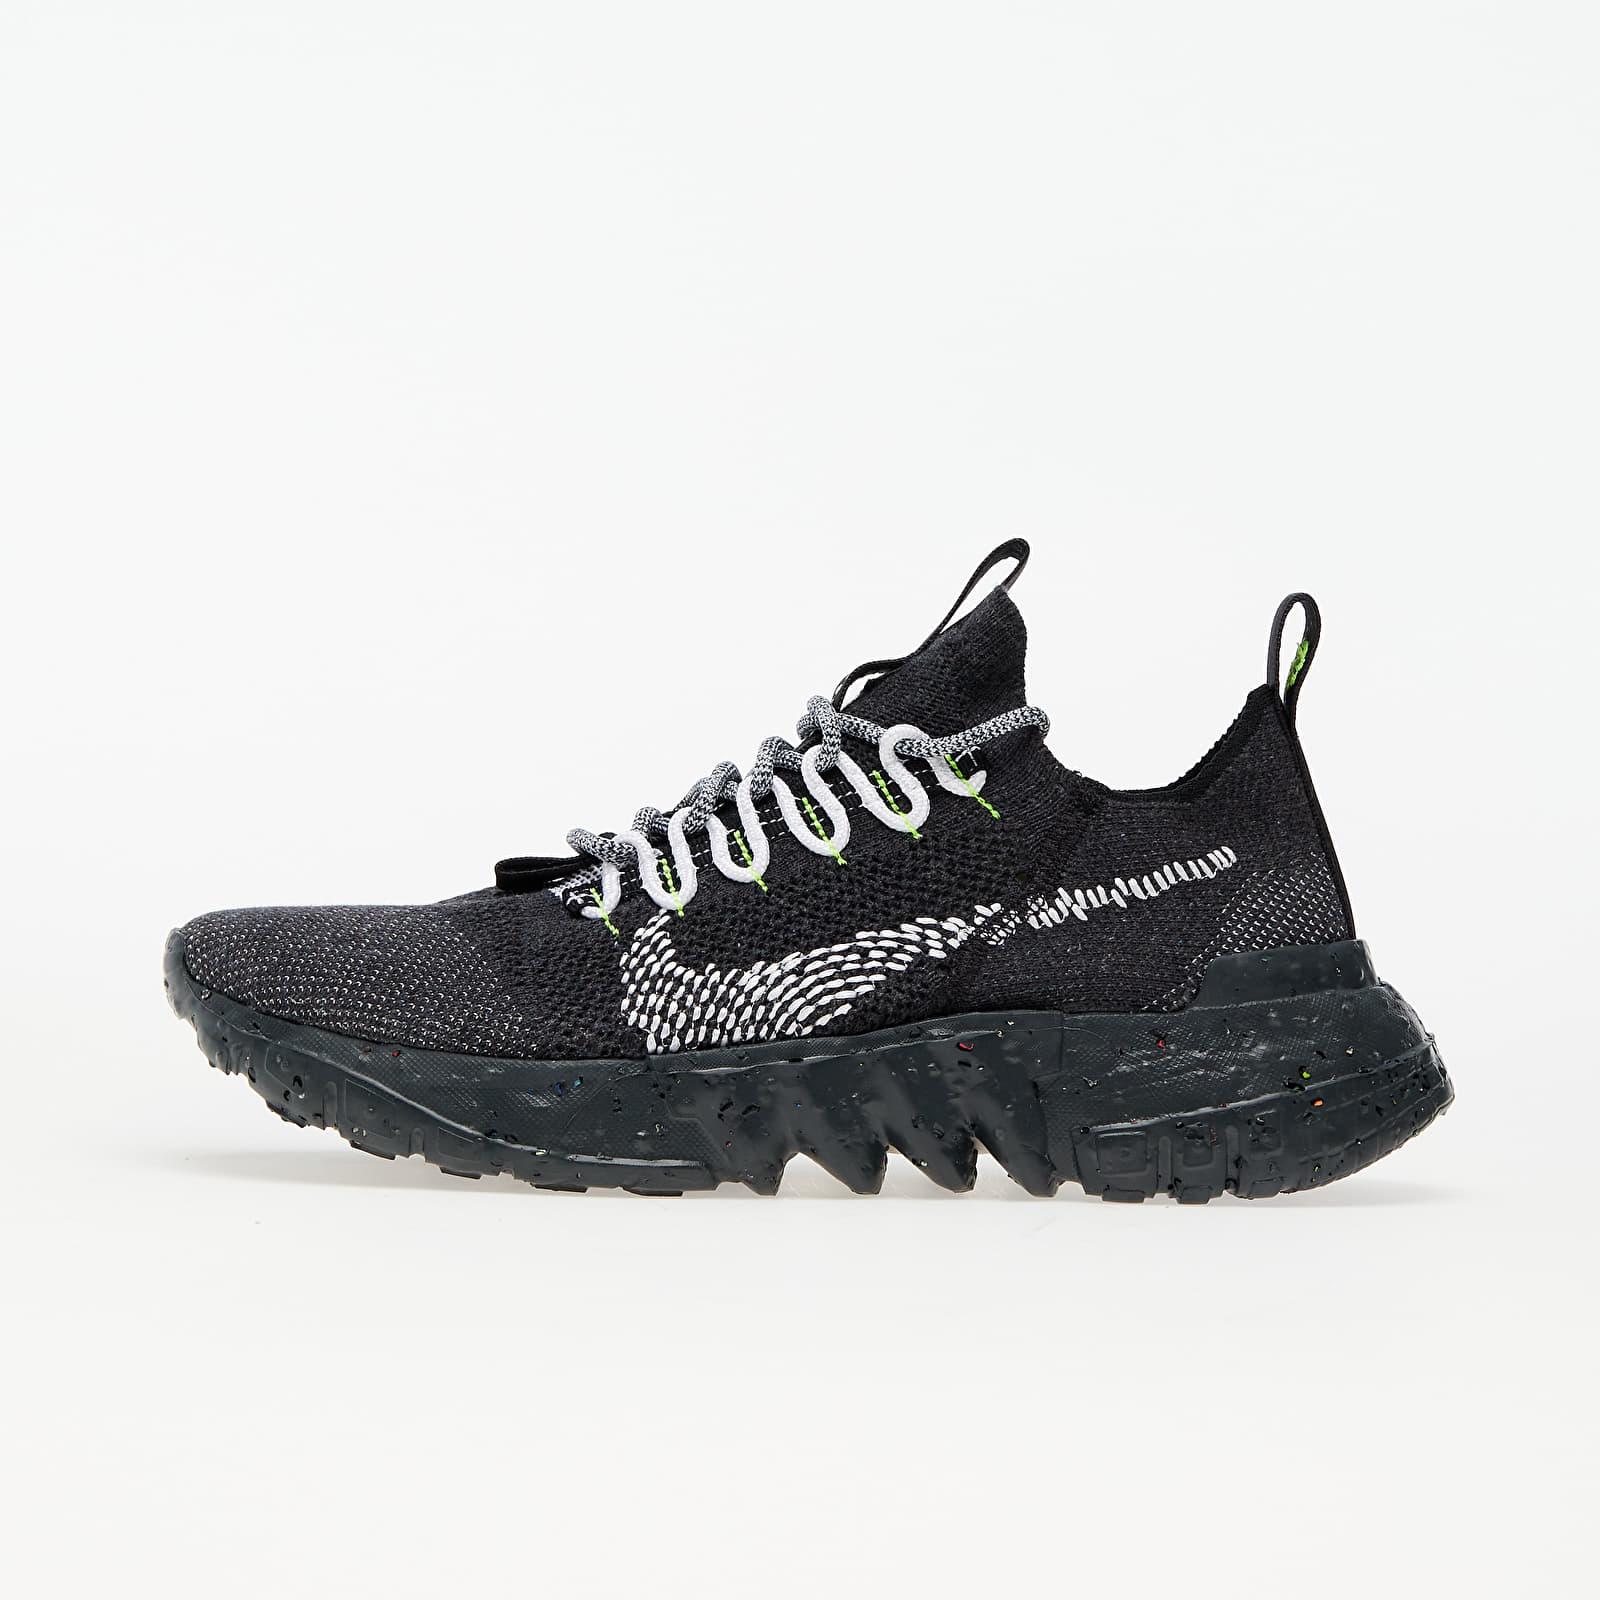 Nike Space Hippie 01 Anthracite/ White-Black-Volt DJ3056-001